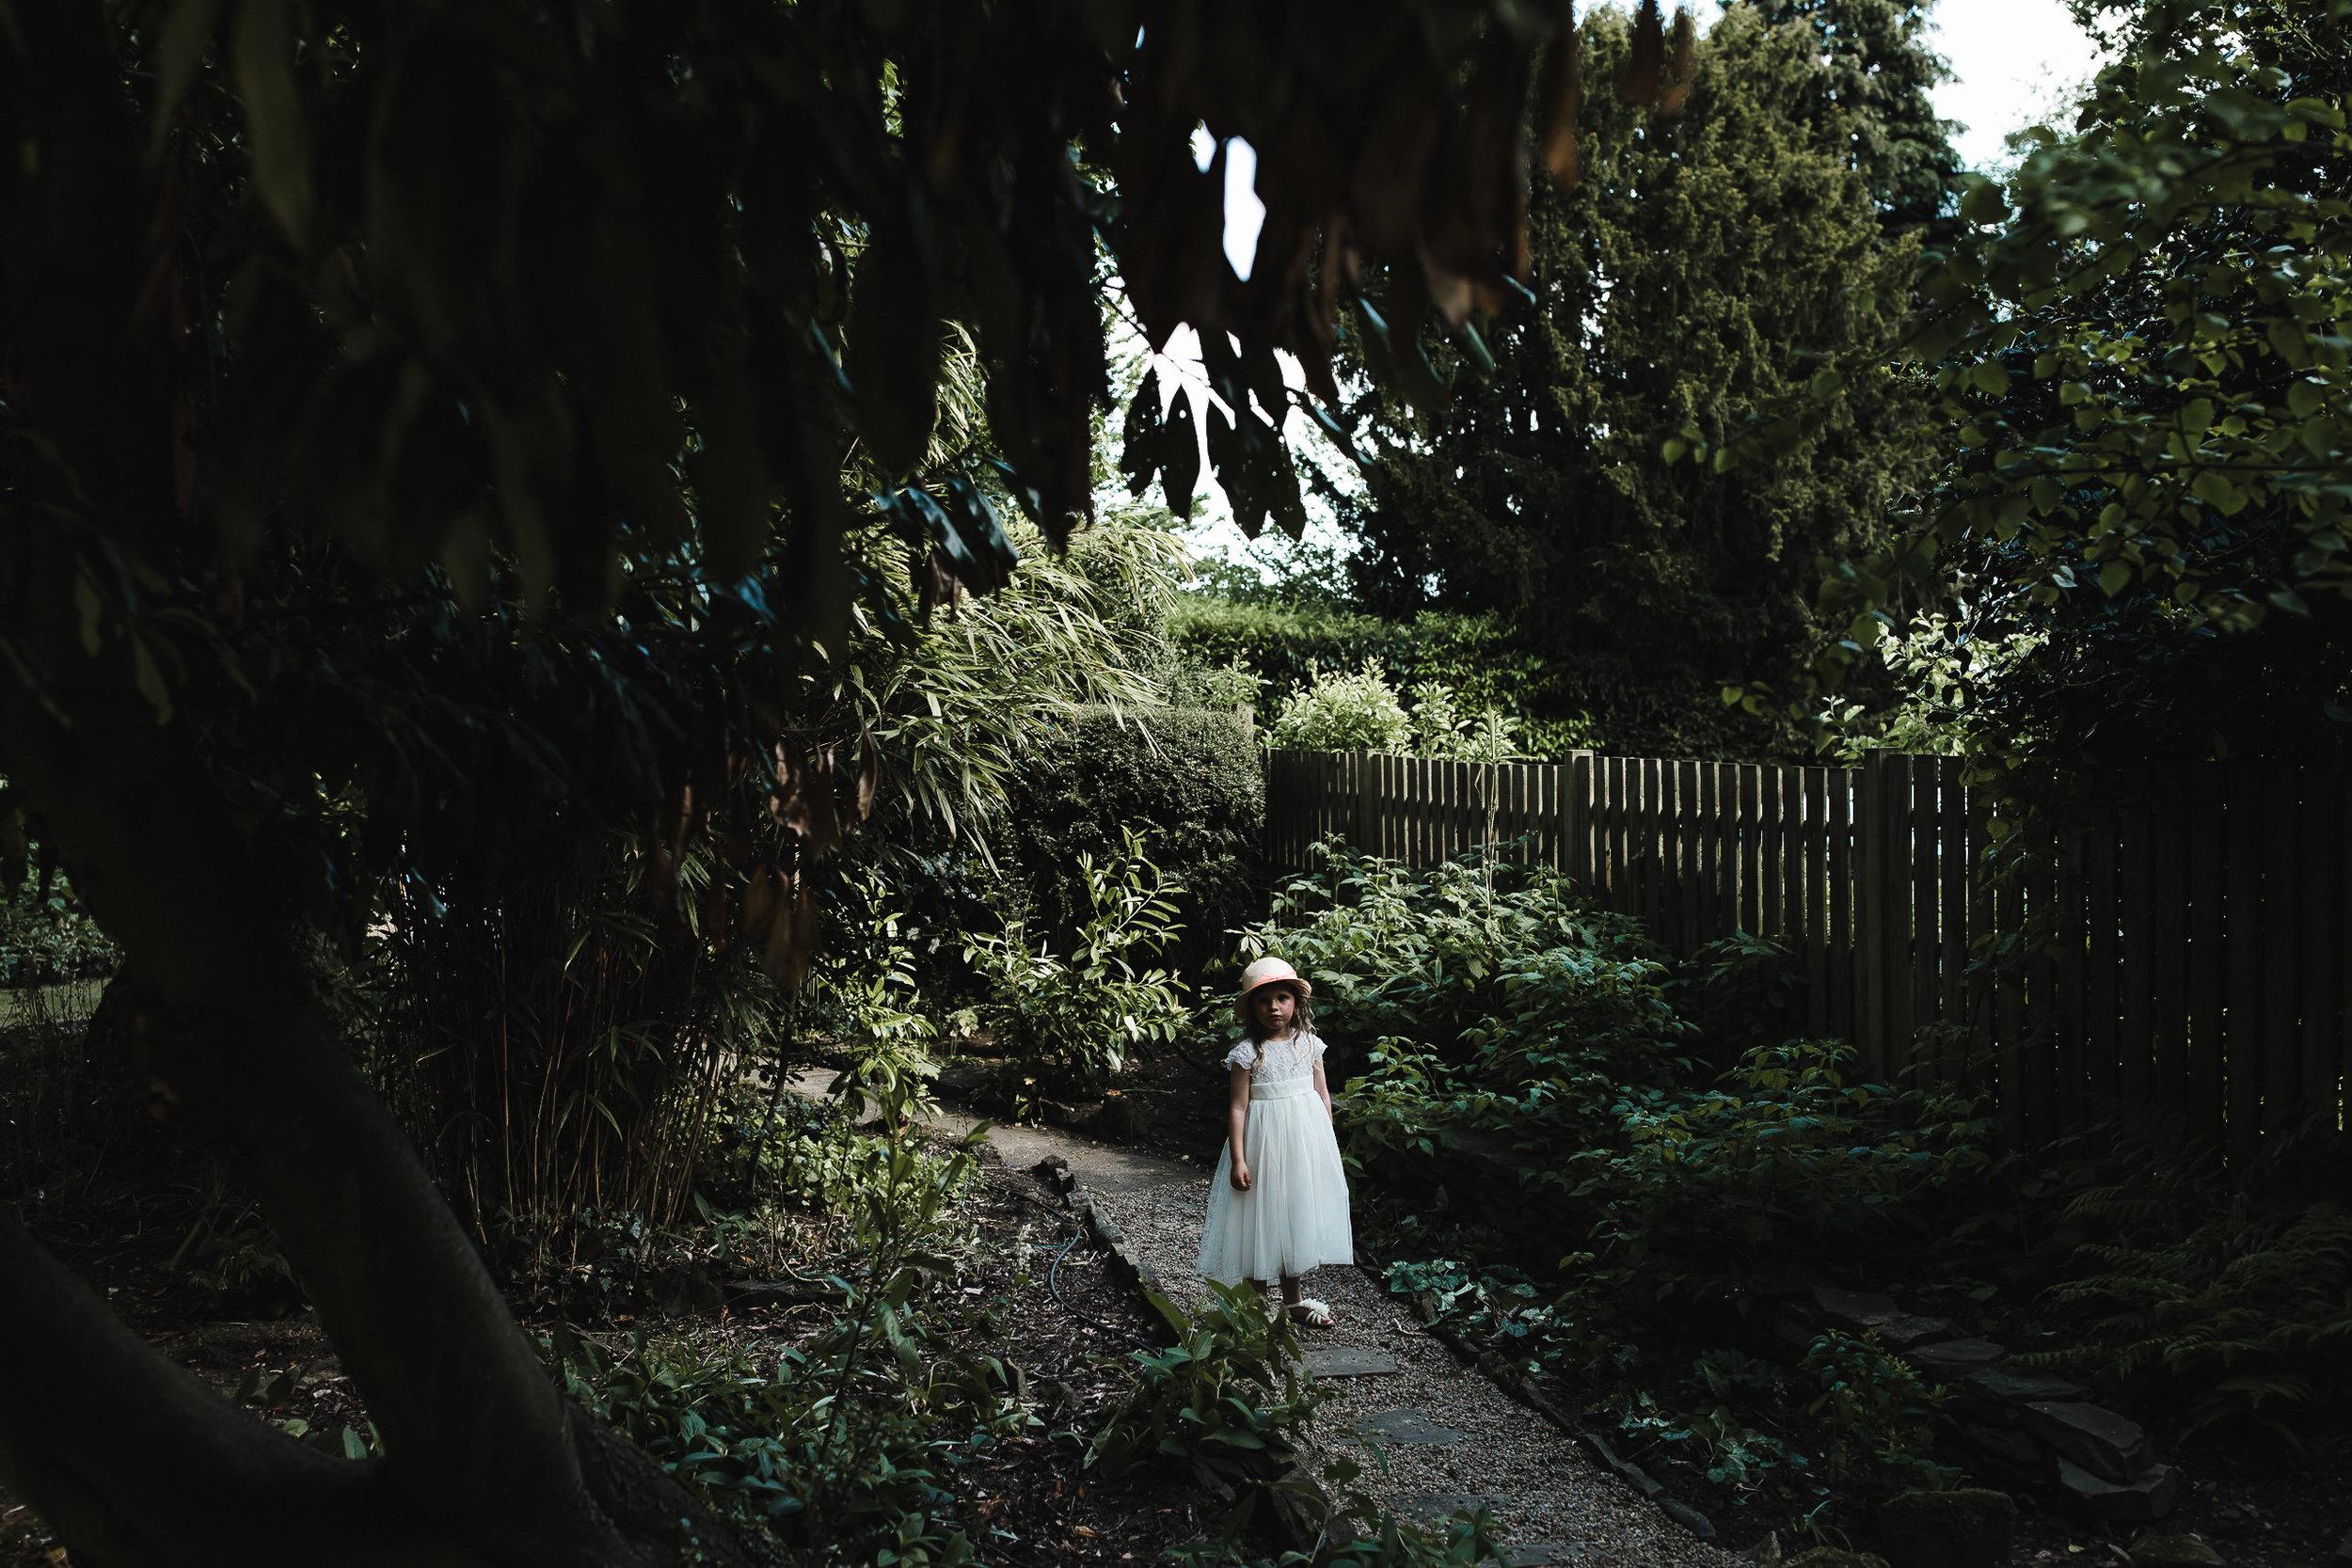 Roundhay-Leeds-Backyard-Wedding-Becs-Chris-156.jpg